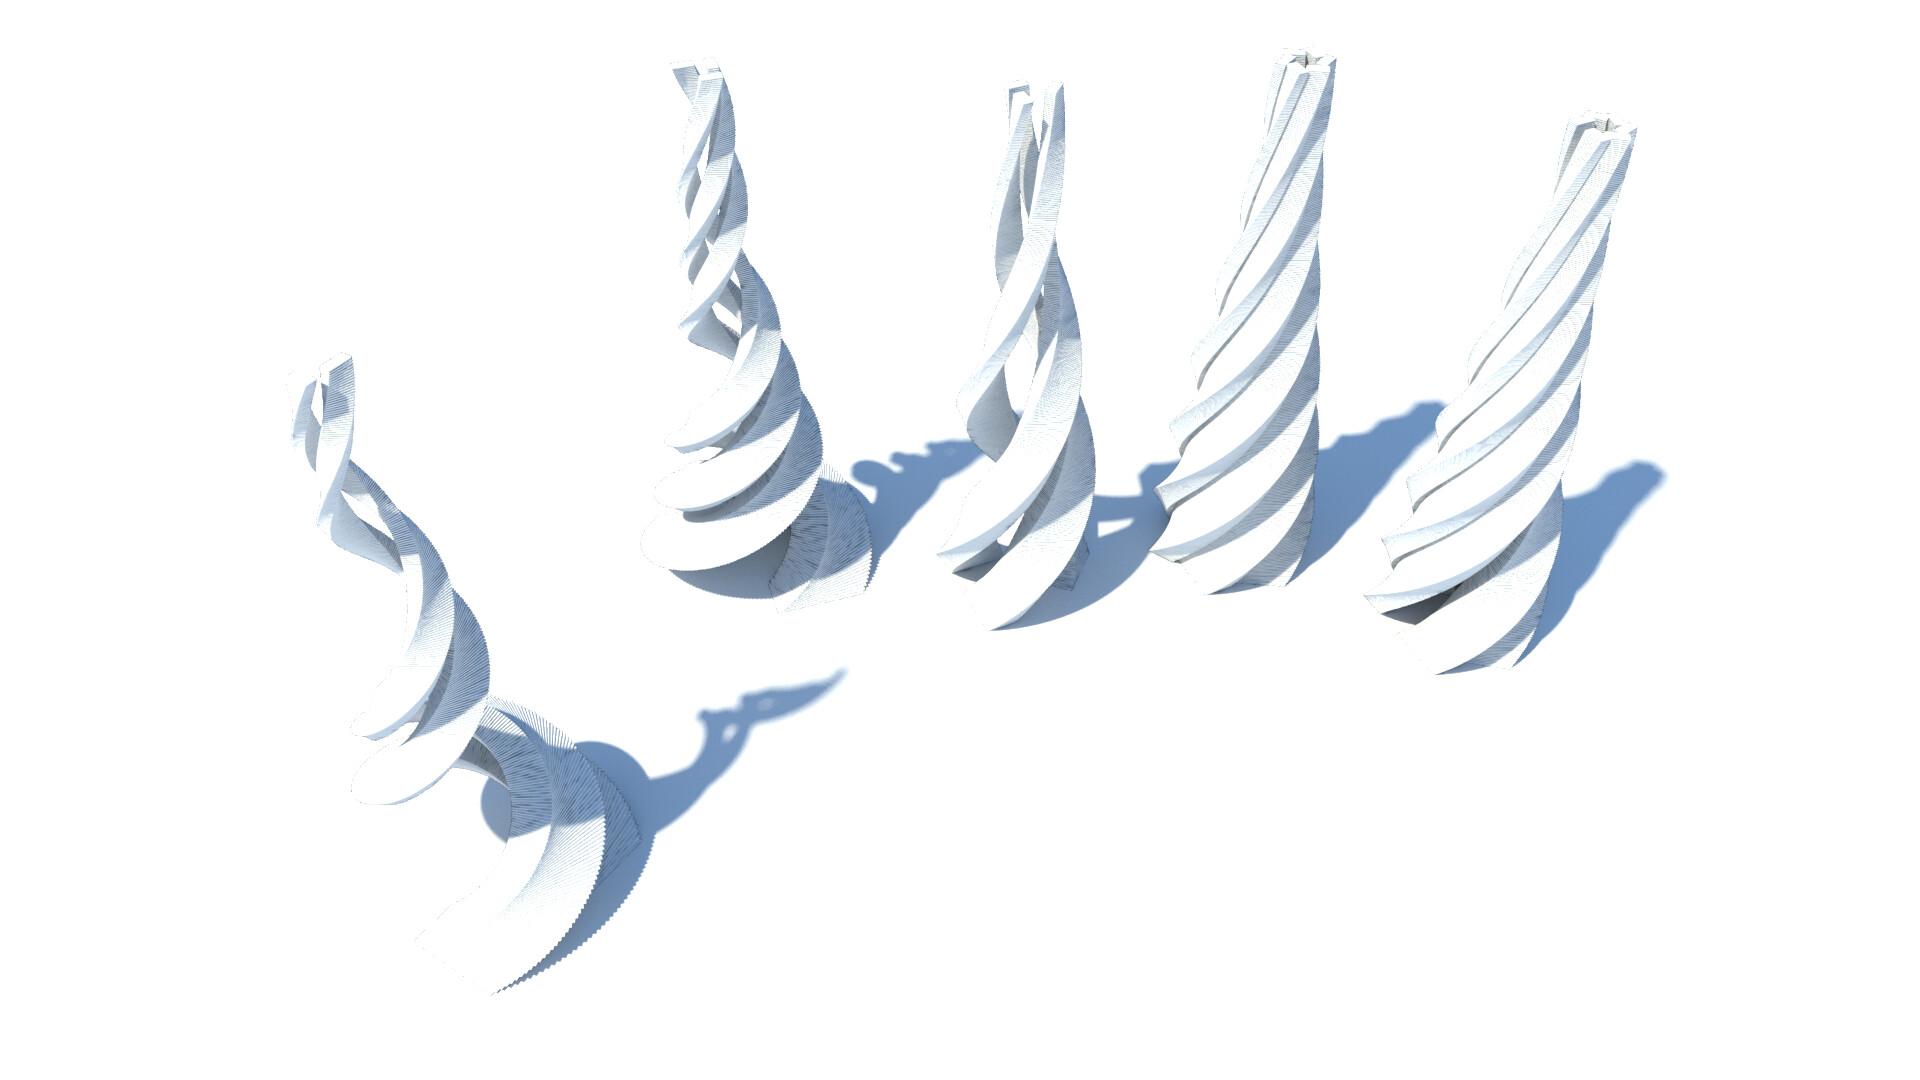 Procedurally-generated spiral towers - bird's eye view